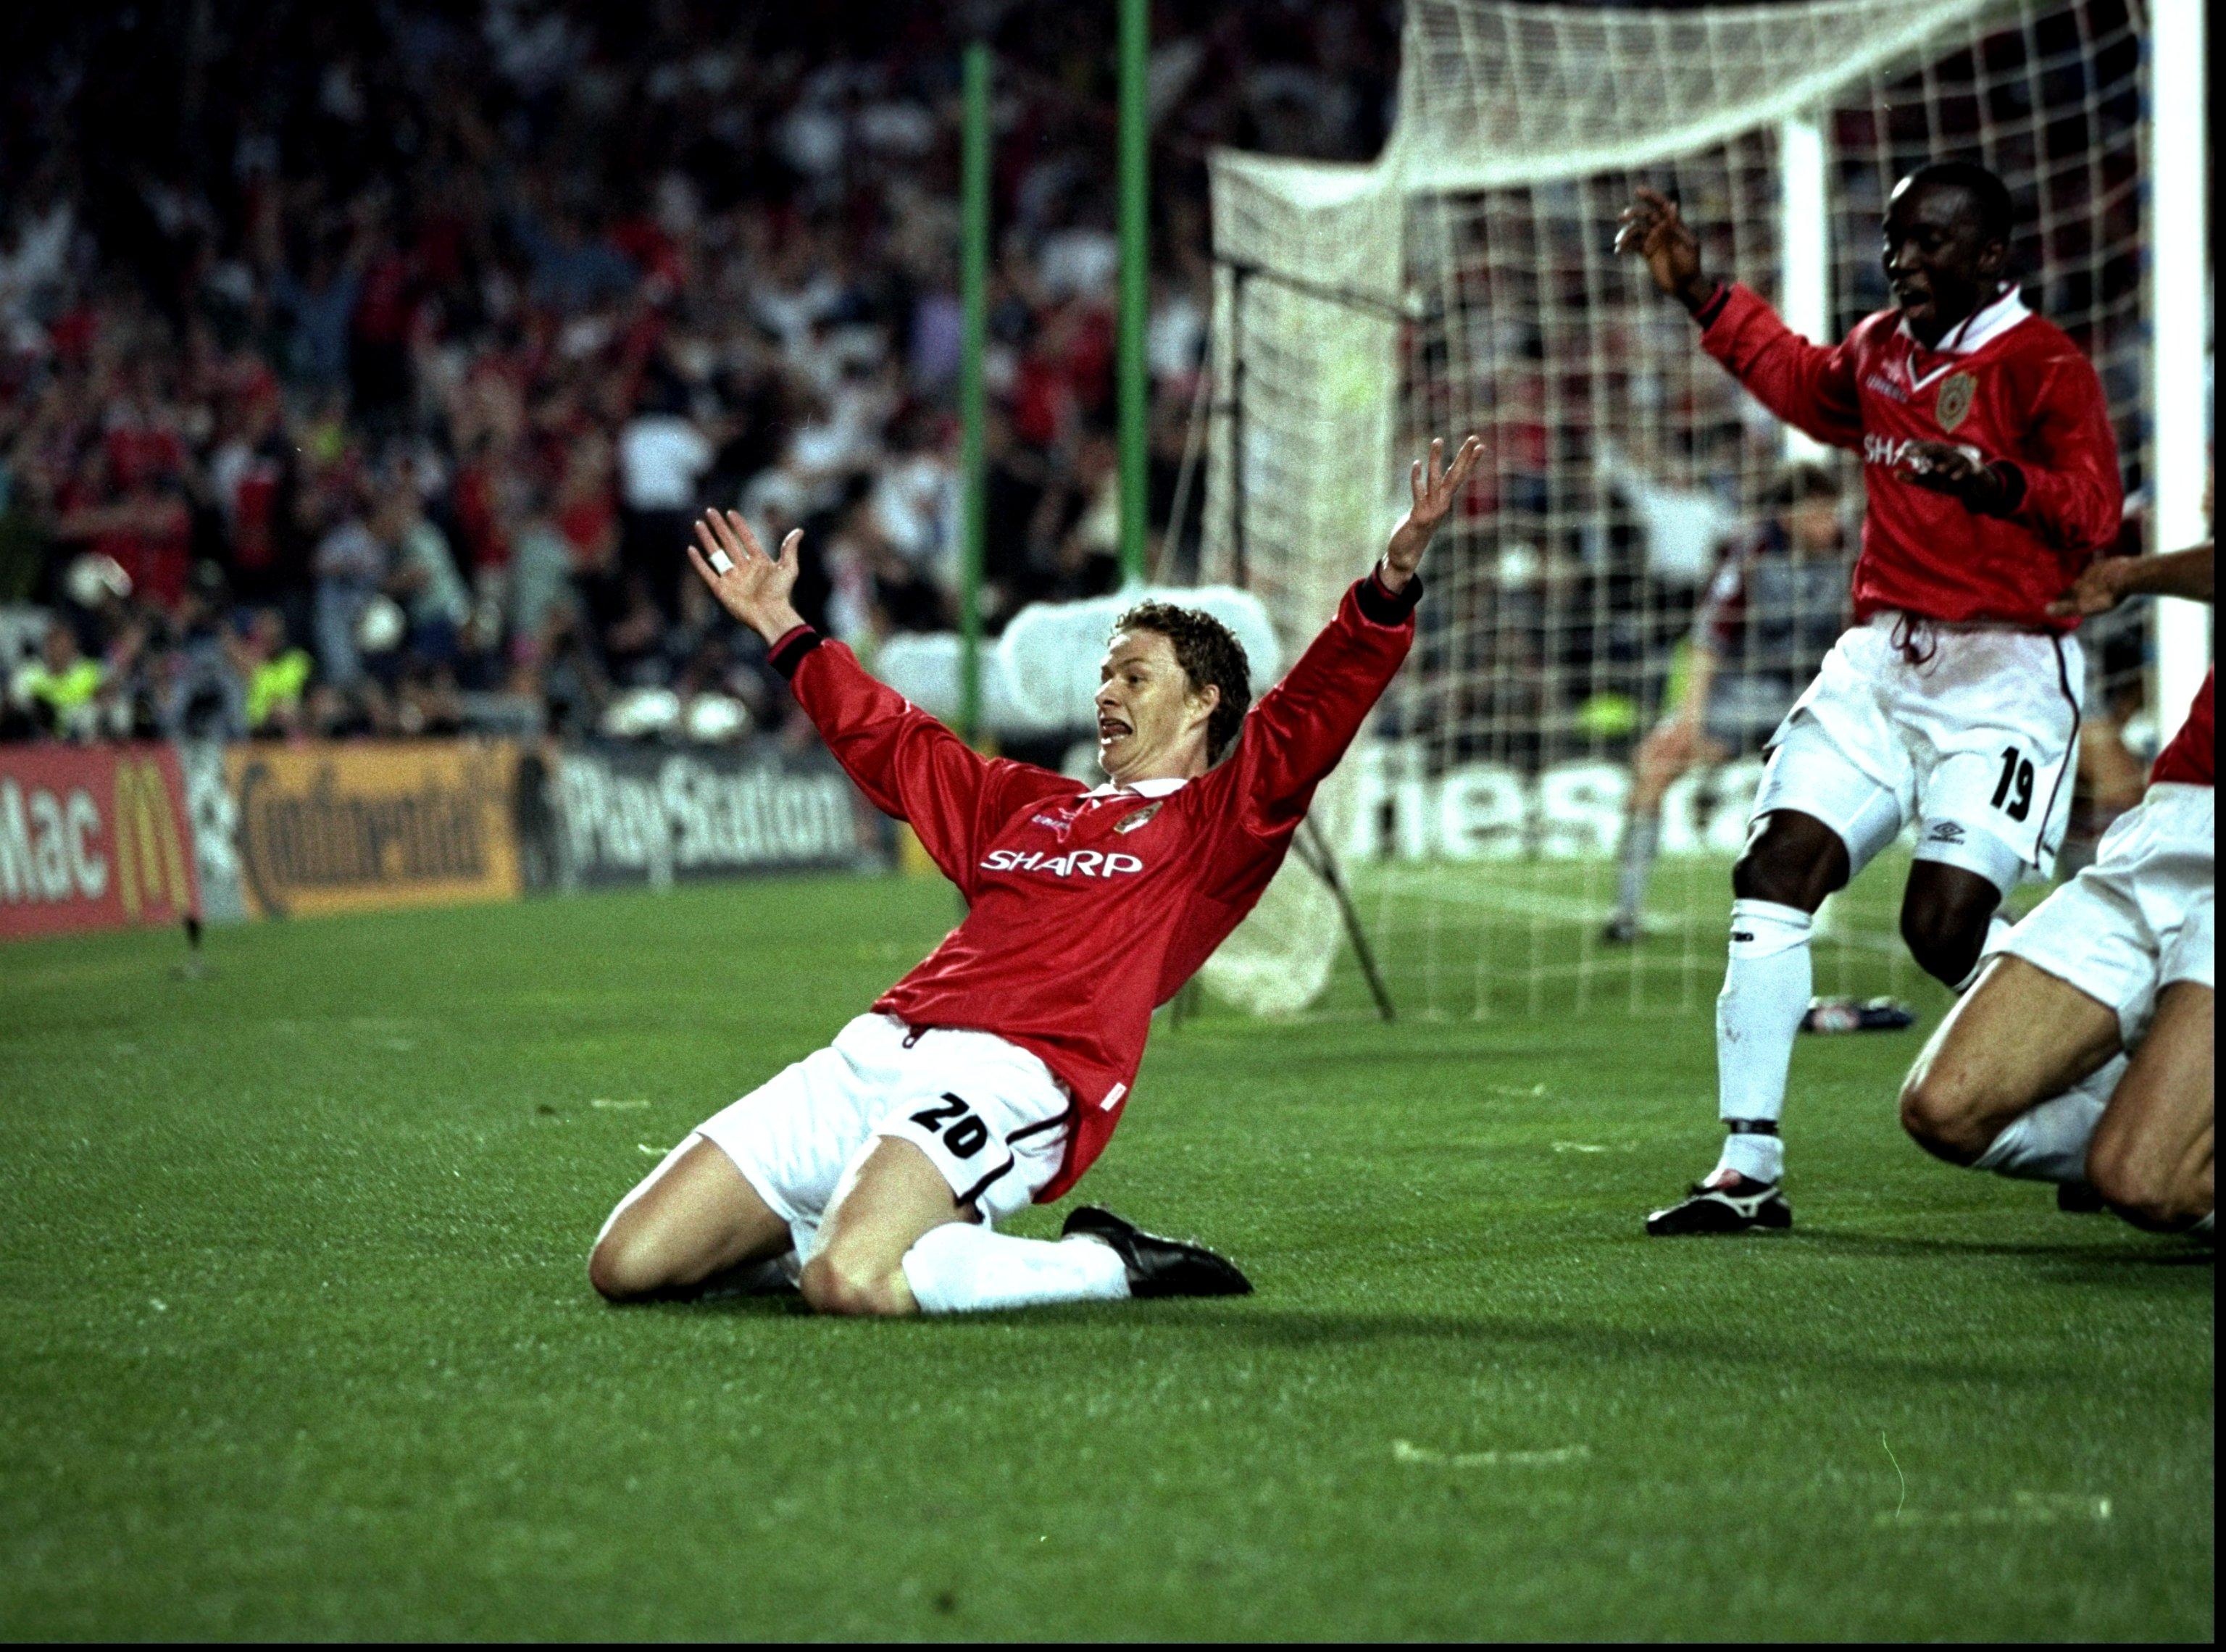 Super sub Ole Gunnar Solskjaer celebrates the goal that won Manchester United their second European Cup